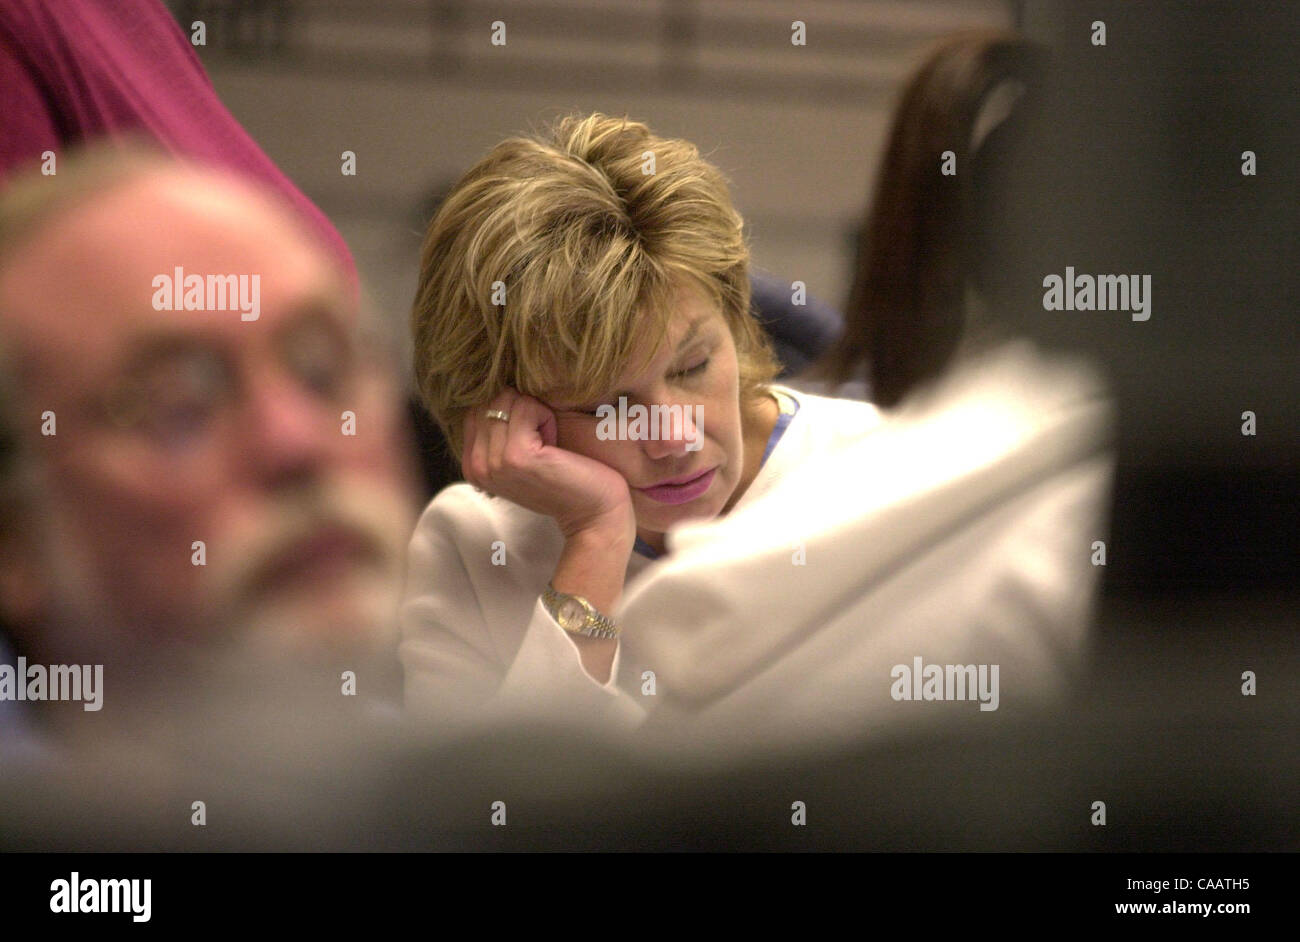 24 HOURS SAN RAMON: (2:17:20 AM) Emergency Room Registered Nurse ...